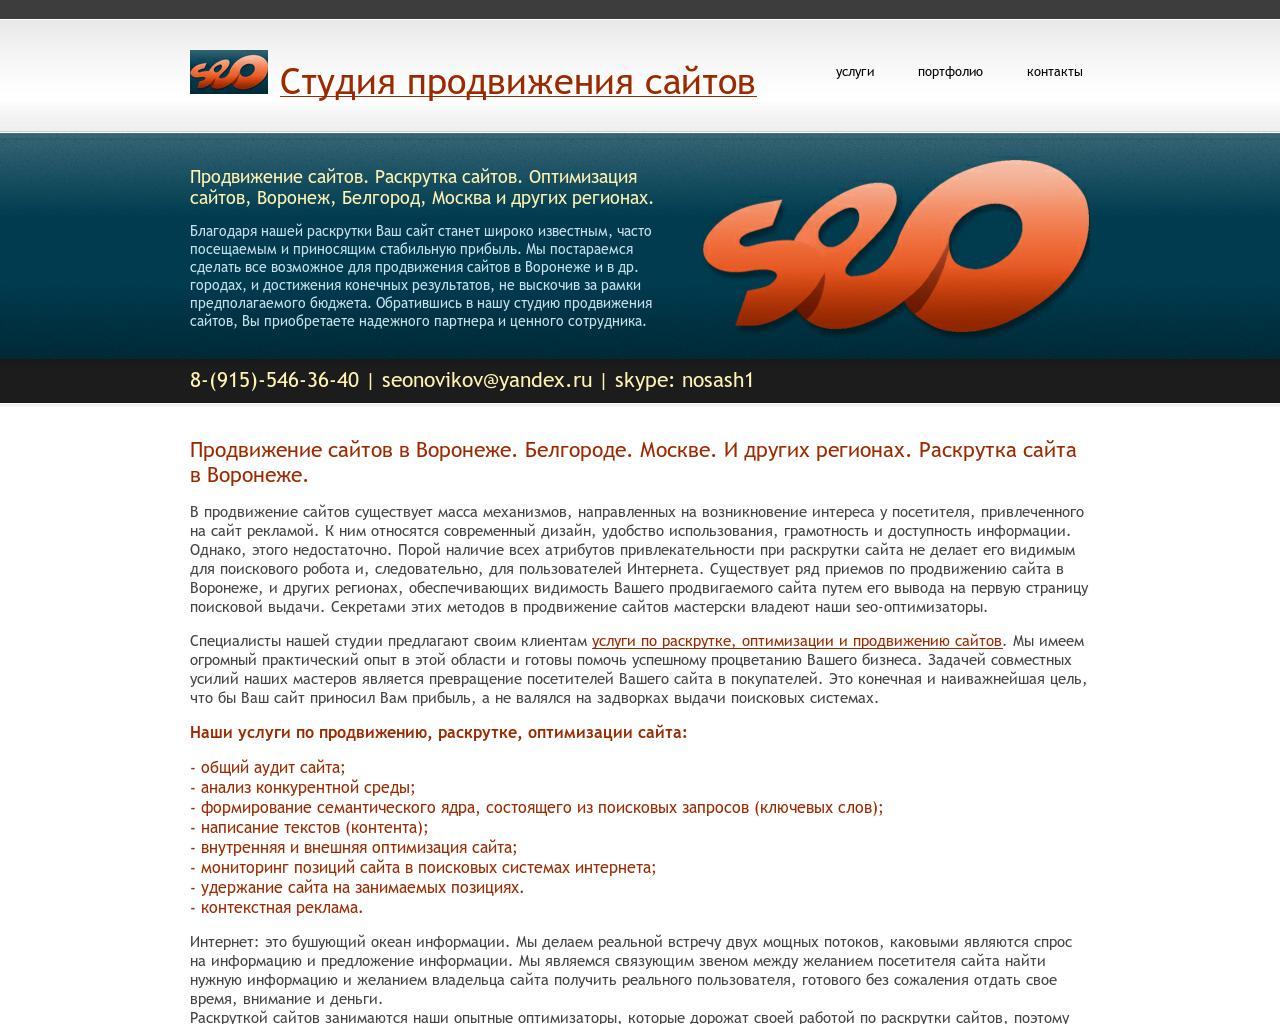 реклама интернета в новосибирске